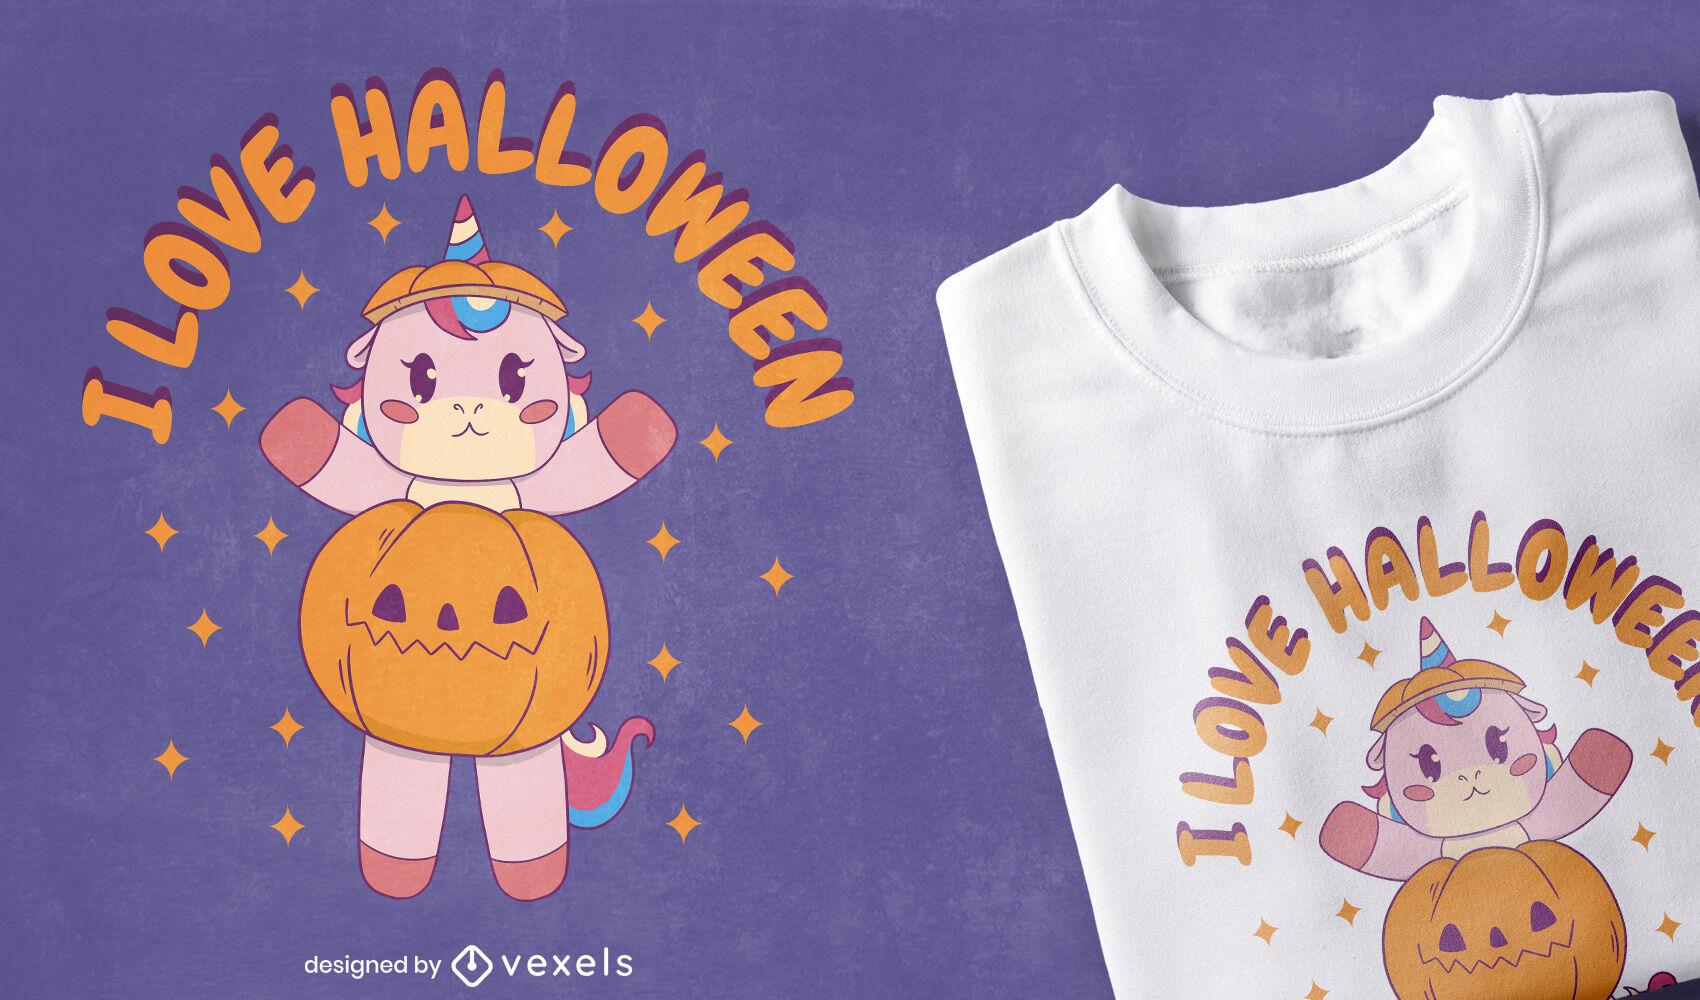 Unicorn in halloween pumpkin t-shirt design